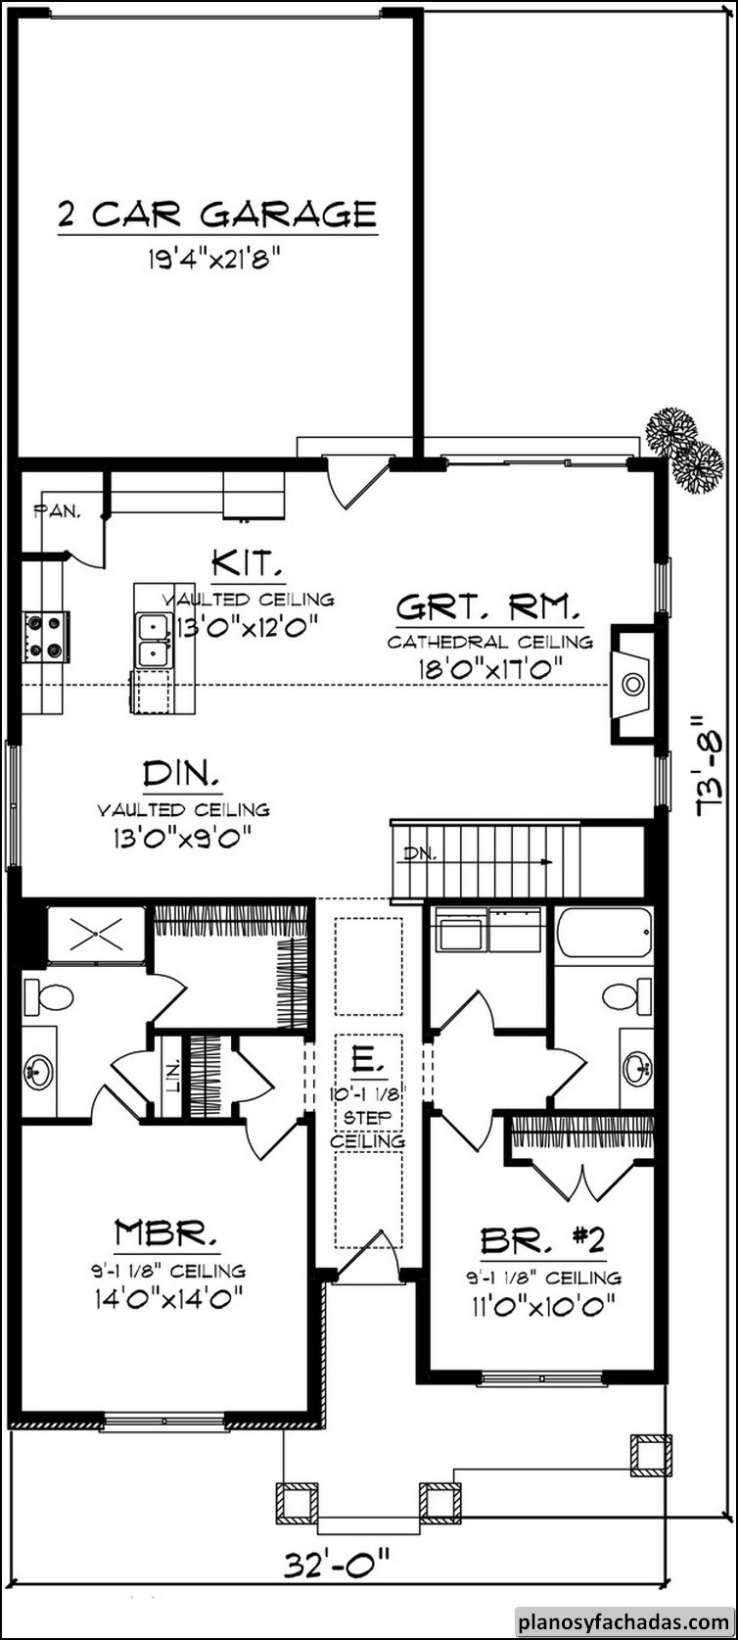 planos-de-casas-221322-FP.jpg